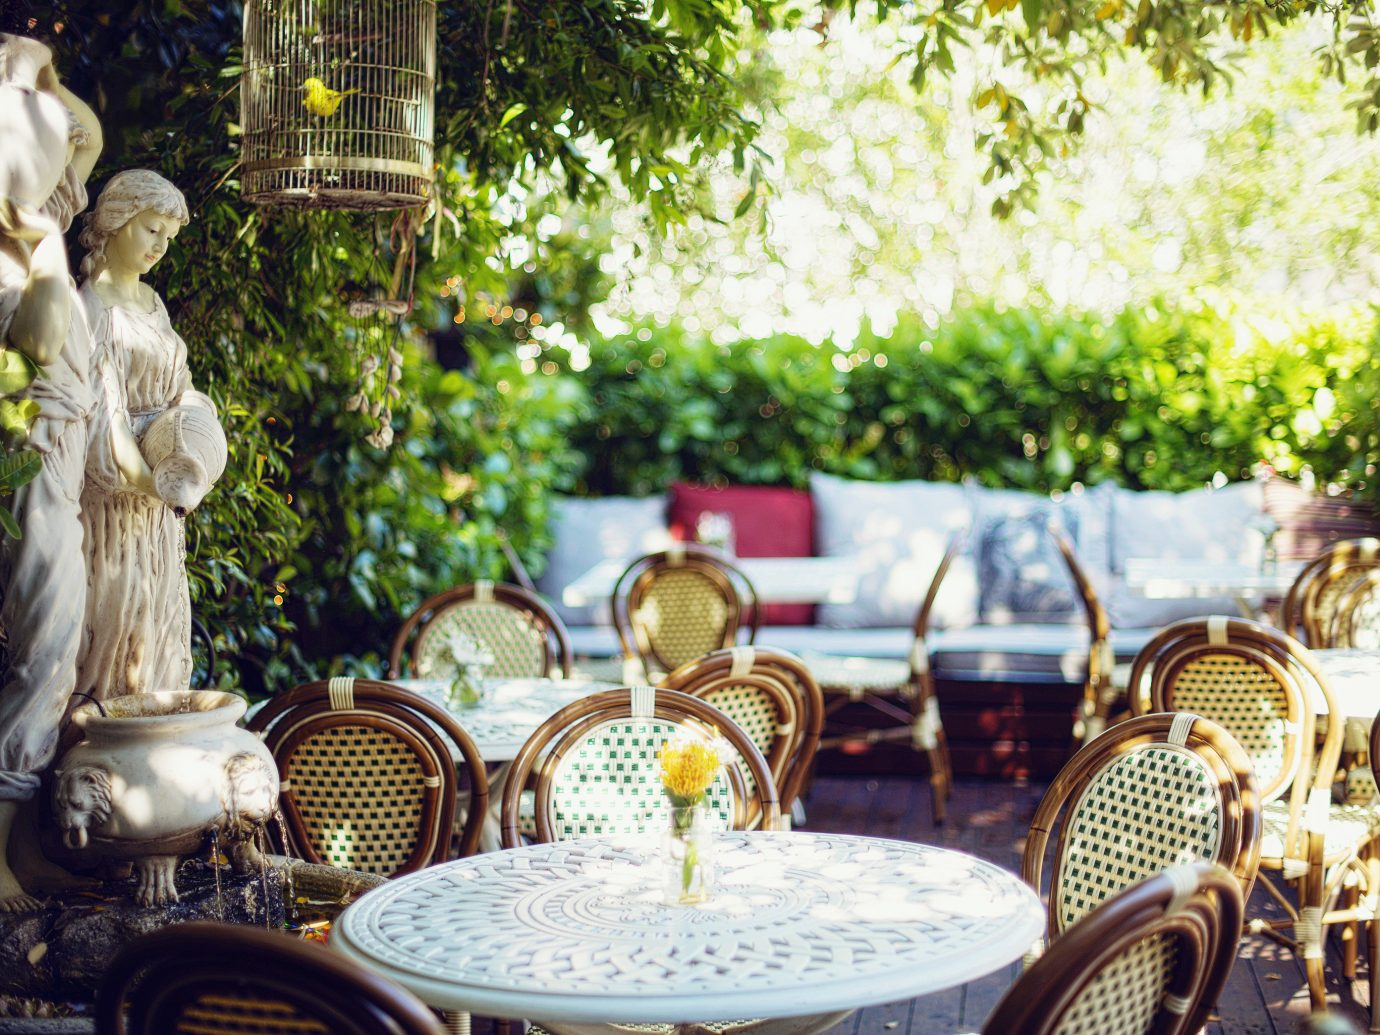 Food + Drink tree outdoor ceremony wedding meal